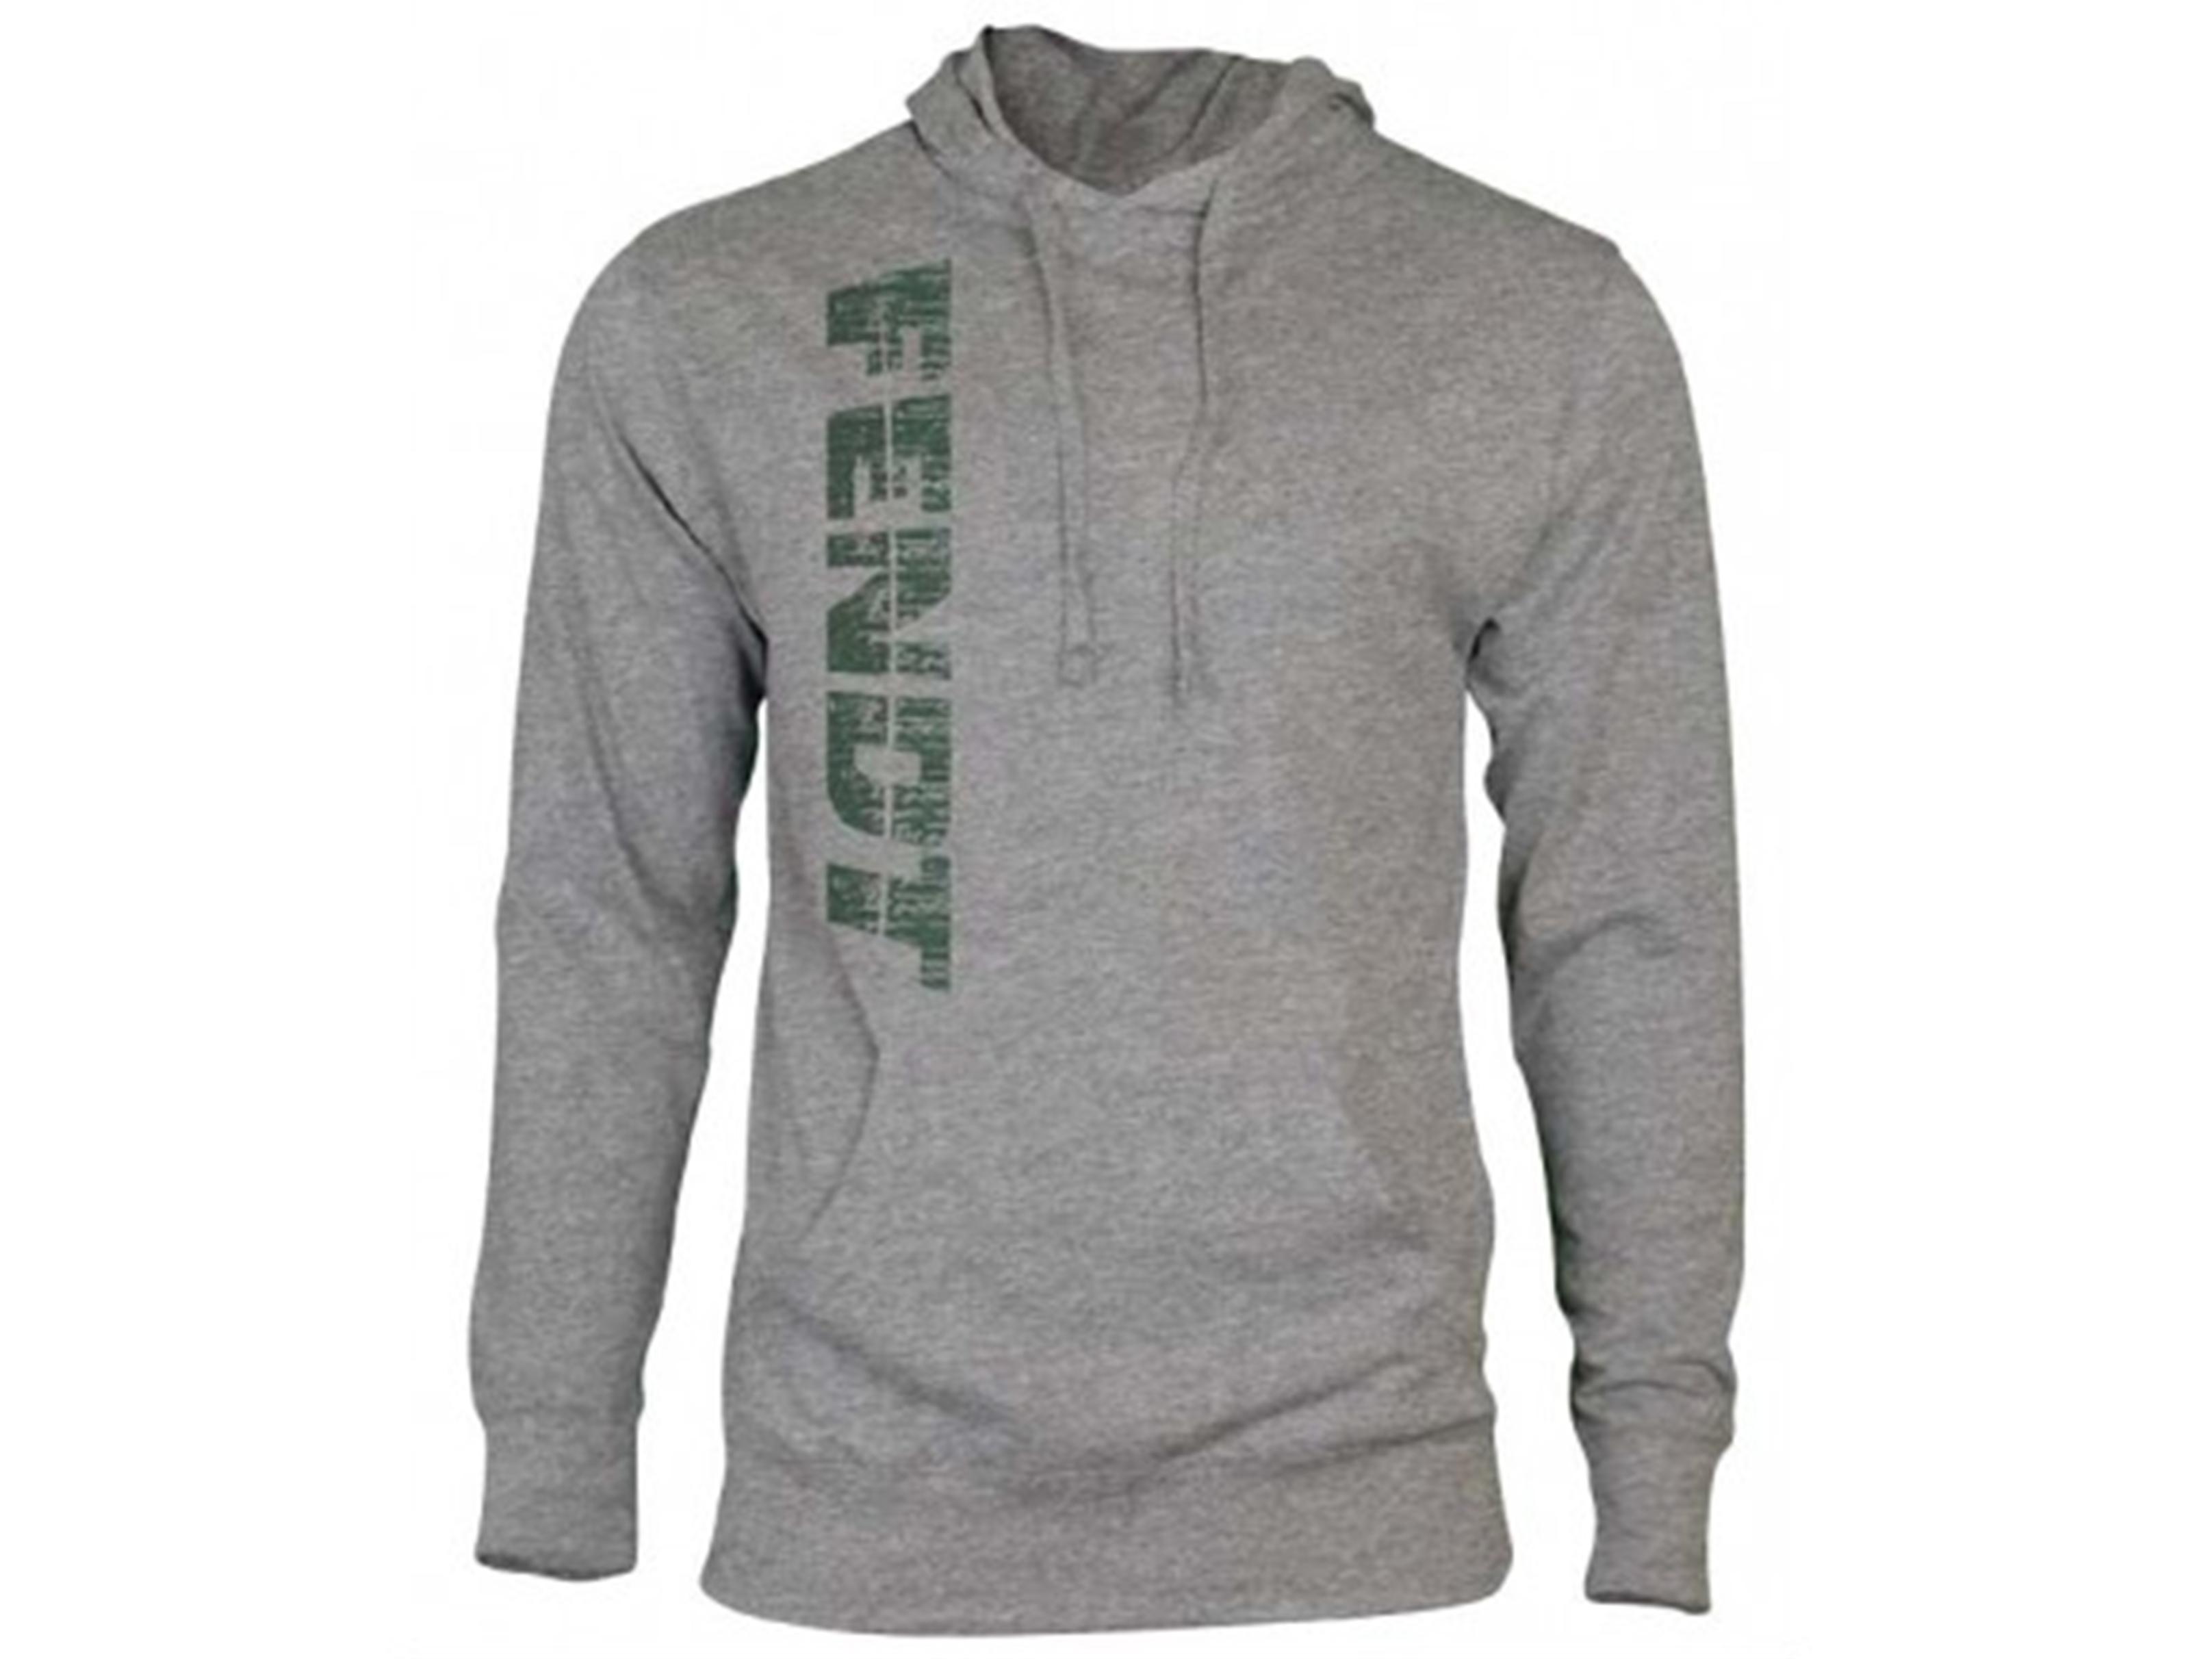 Fendt Hooded Long-Sleeve Shirt